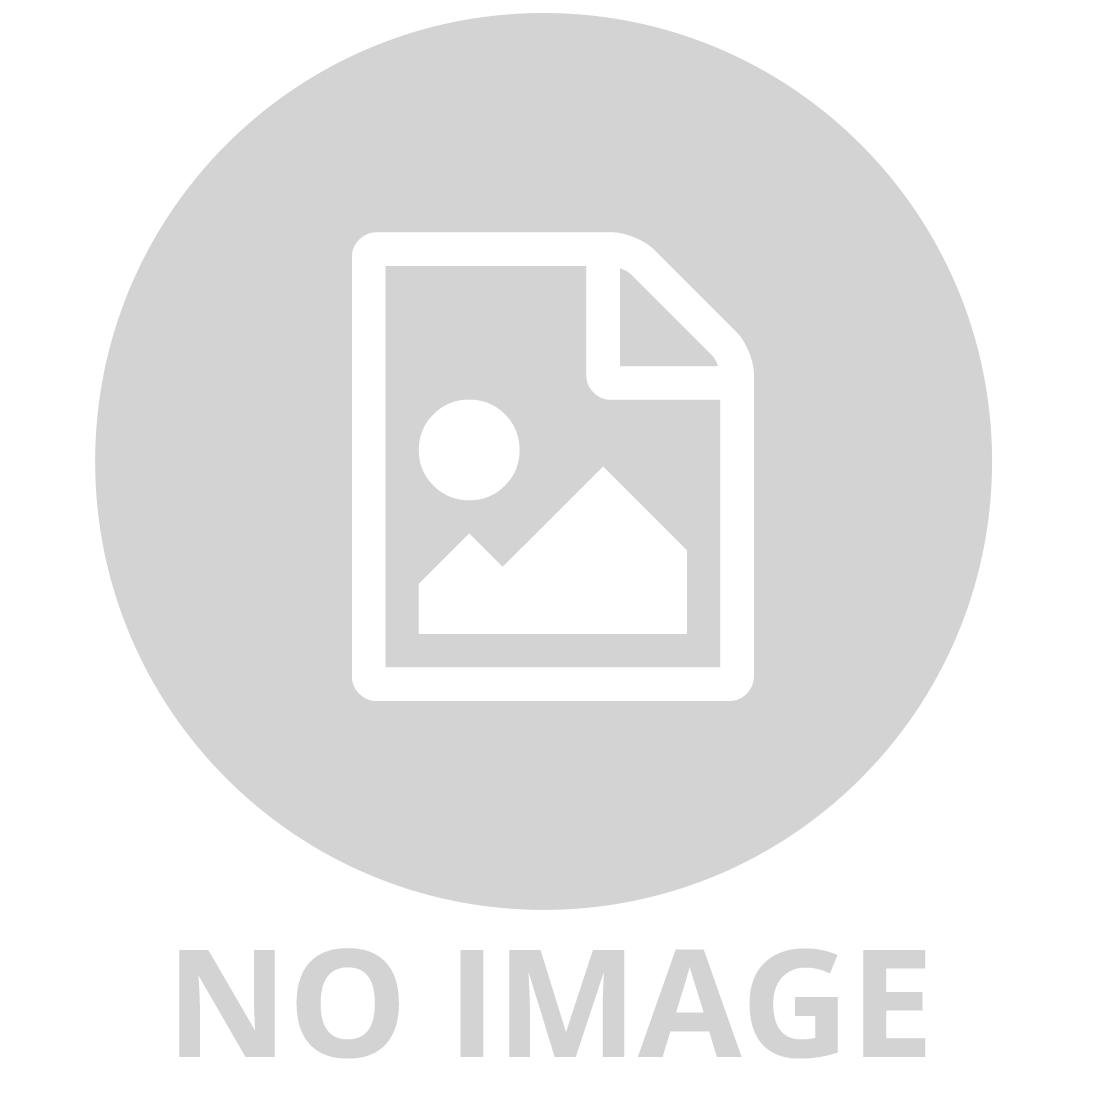 LEGO CREATOR 31099 PROPELLER PLANE